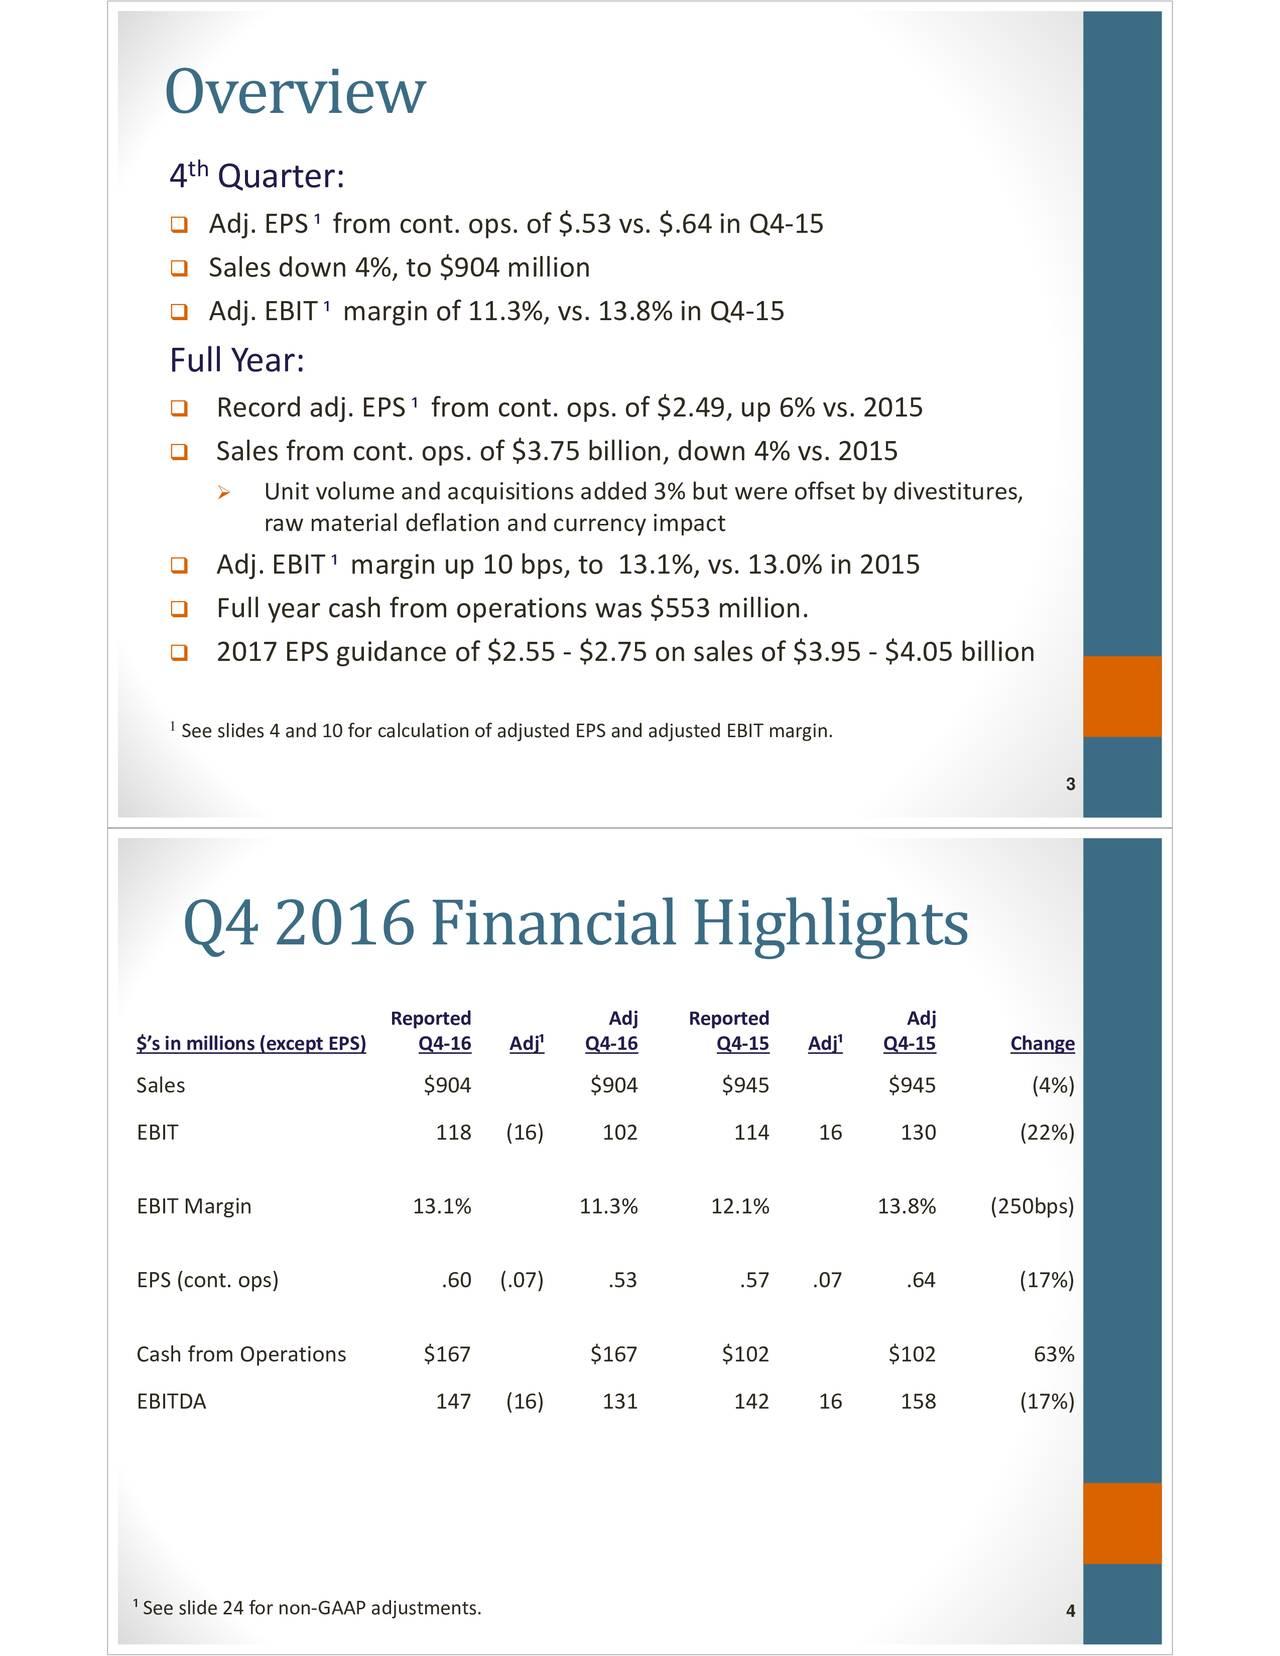 th 4 Quarter: Adj.EPS fromcont.ops.of$.53vs.$.64inQ415 Salesdown4%,to$904million Adj.EBIT marginof11.3%,vs.13.8%inQ415 FullYear: Recordadj.EPS fromcont.ops.of$2.49,up6%vs.2015 Salesfromcont.ops.of$3.75billion,down4%vs.2015 Unitvolumeandacquisitionsadded3%butwereoffsetbydivestitures, rawmaterialdeflationandcurrencyimpact Adj.EBIT marginup10bps,to13.1%,vs.13.0%in2015 Fullyearcashfromoperationswas$553million. 2017EPSguidanceof$2.55 $2.75onsalesof$3.95 $4.05billion 1Seeslides4and10forcalculationofadjustedEPSandadjustedEBITmargin. 3 Q4 2016 Financial Highlights Reported Adj Reported Adj $sinmillions(exceptEPS) Adj Q416 Q415 Adj Q415 Change Sales $904 $904 $945 $945 (4%) EBIT 118 (16) 102 114 16 130 (22%) EBITMargin 13.1% 11.3% 12.1% 13.8% (250bps) EPS(cont.ops) .60 (.07) .53 .57 .07 .64 (17%) CashfromOperations $167 $167 $102 $102 63% EBITDA 147 (16) 131 142 16 158 (17%) Seeslide24fornonGAAPadjustments. 4